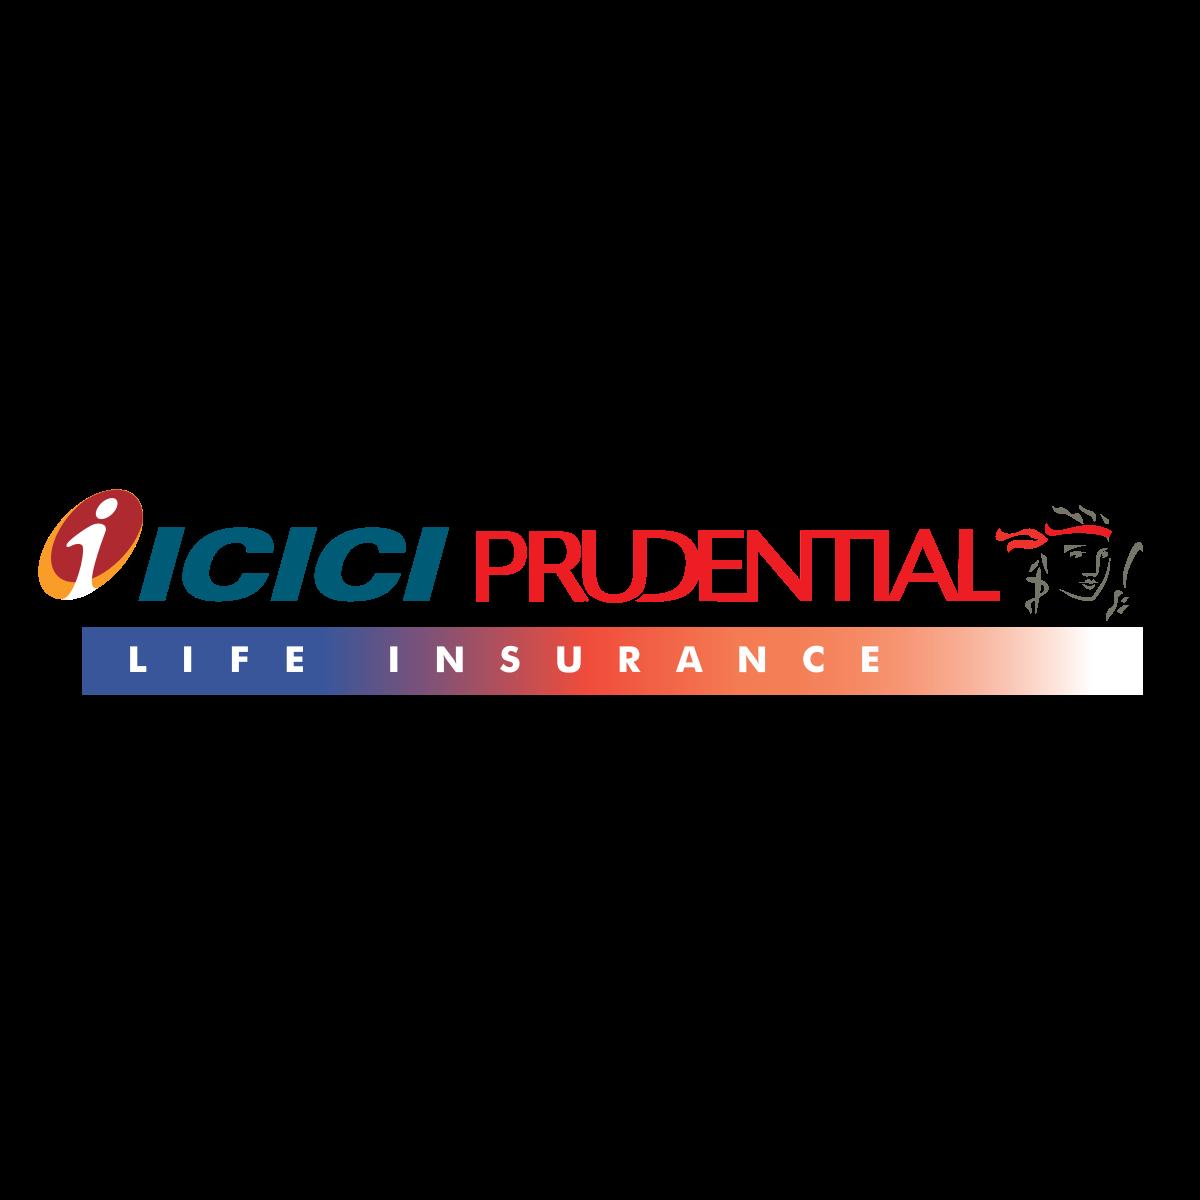 ICICI Prudential Life Insurance Company